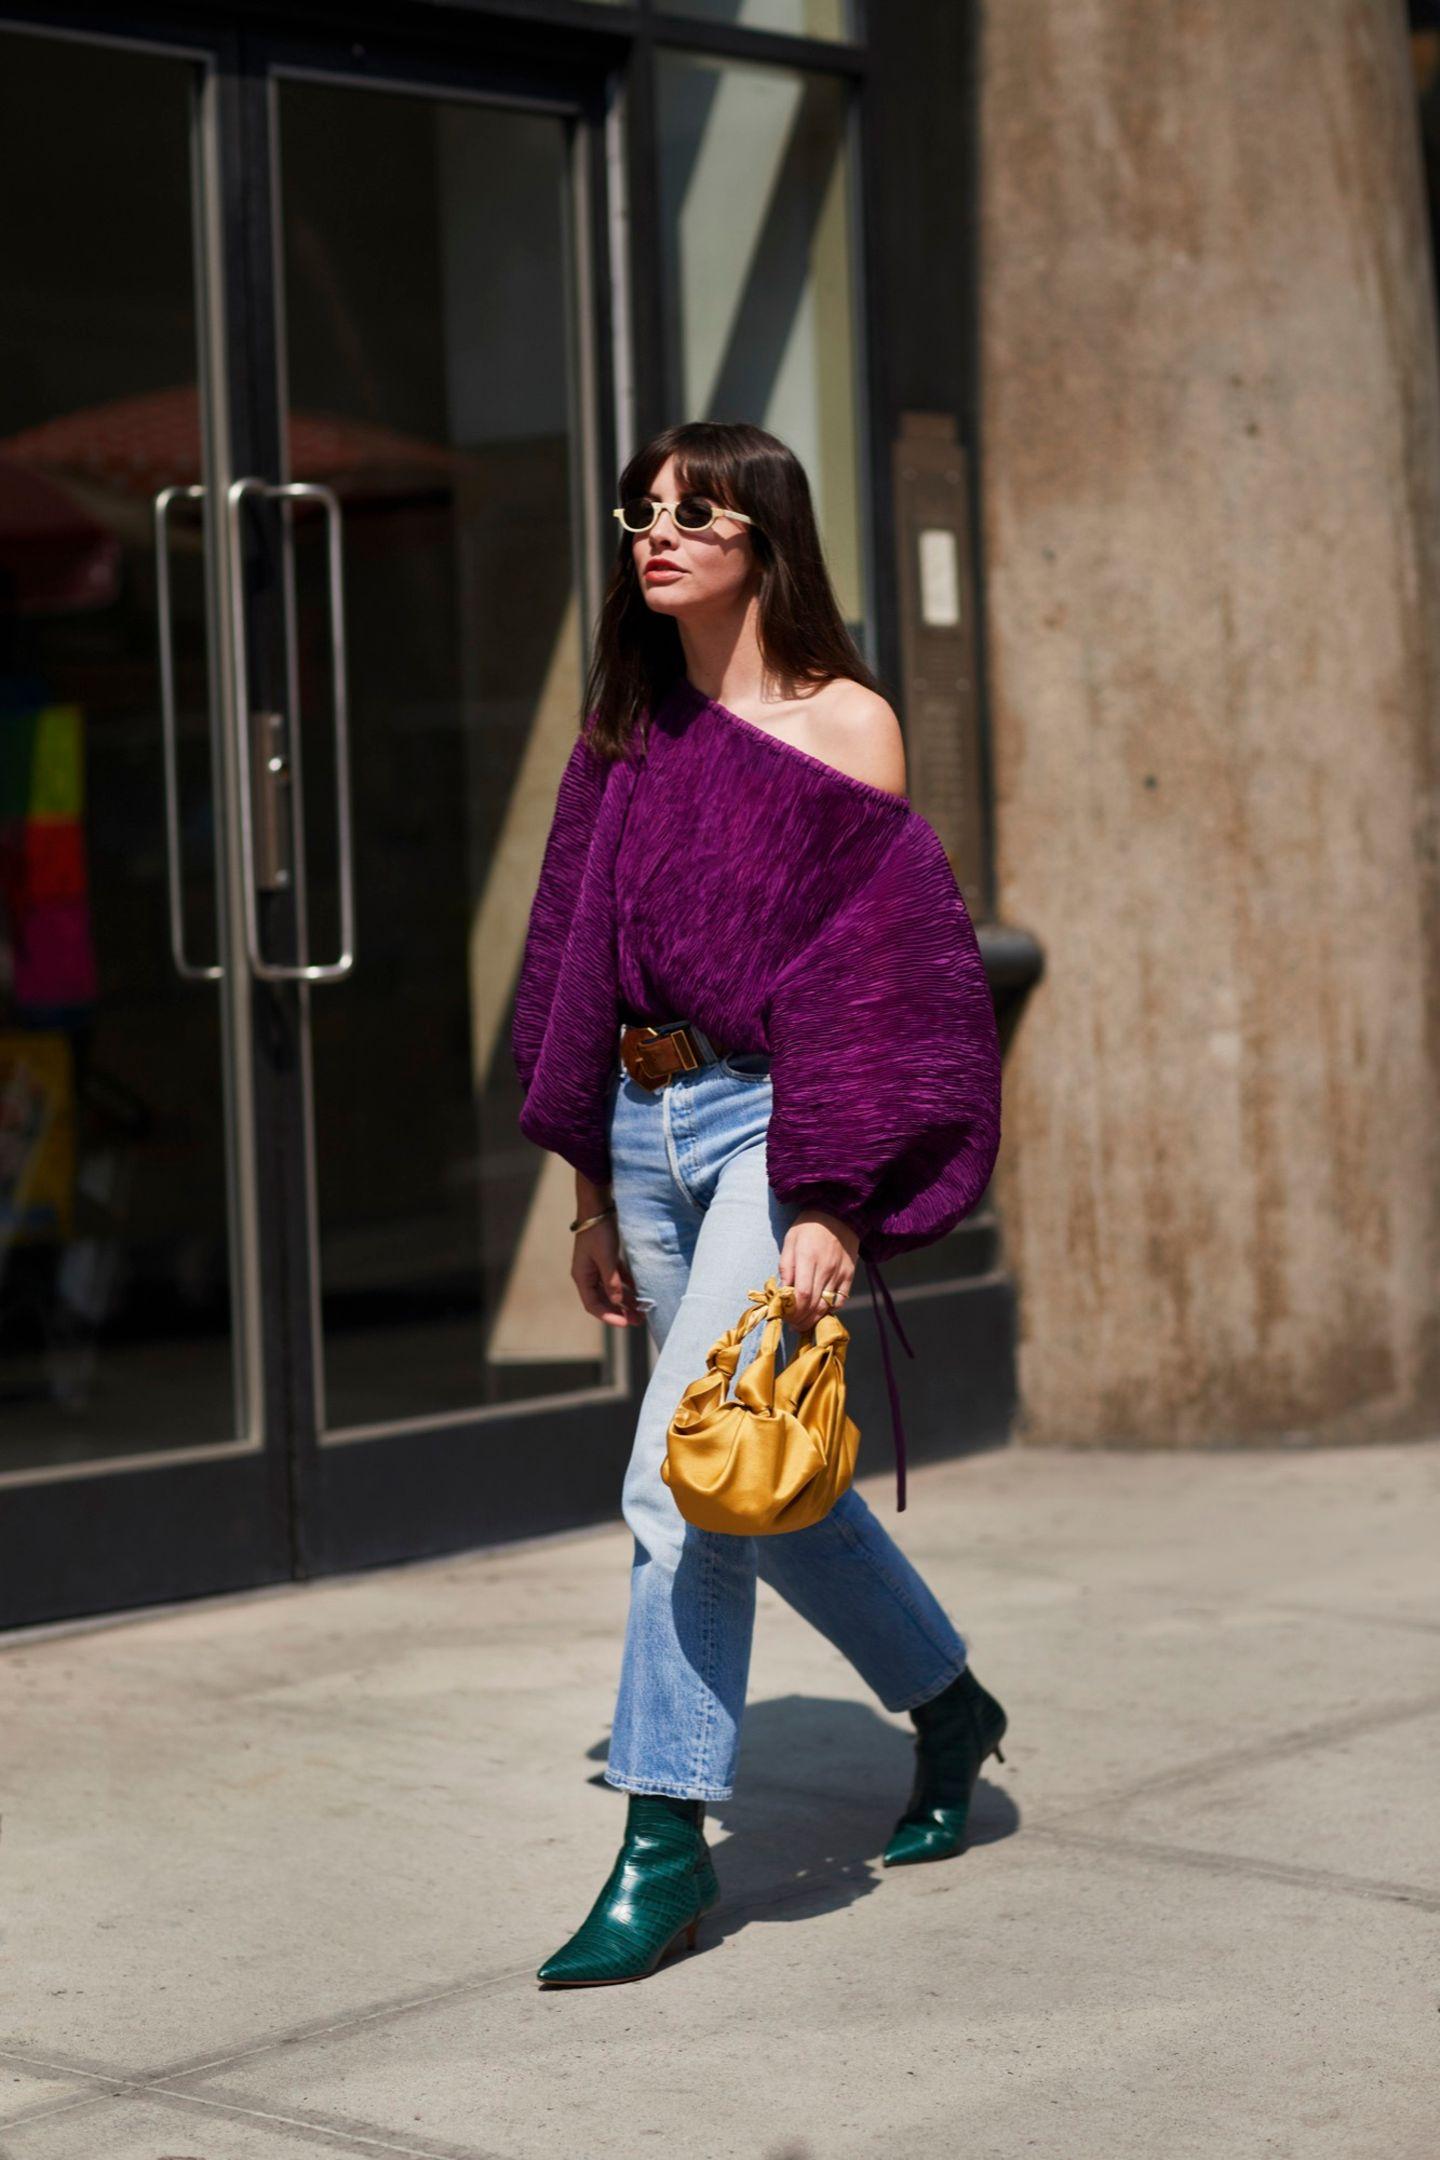 Frau trägt Oversized Pullover in Lila